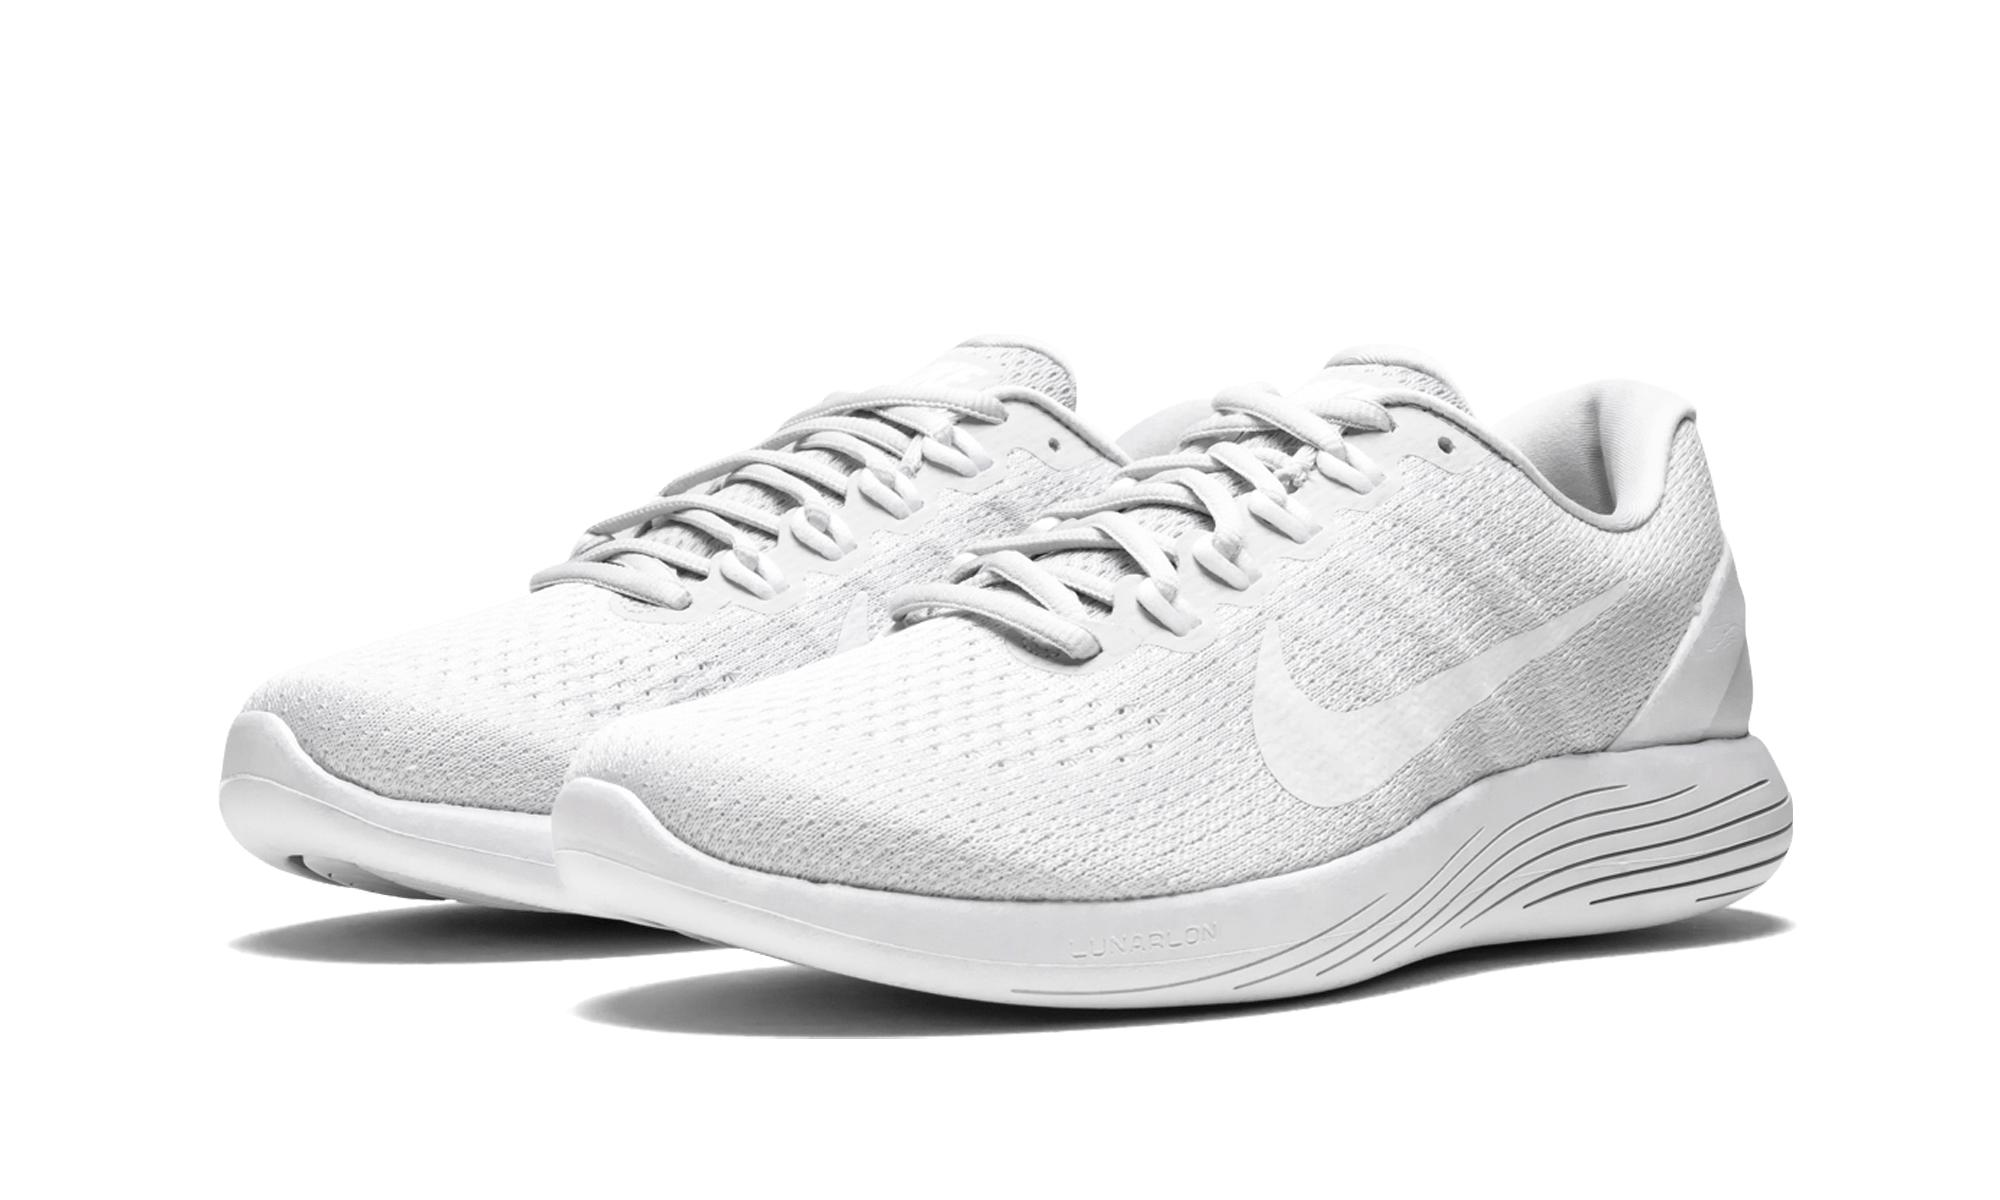 09aadd15dfd Nike - White Lunarglide 9 for Men - Lyst. View fullscreen